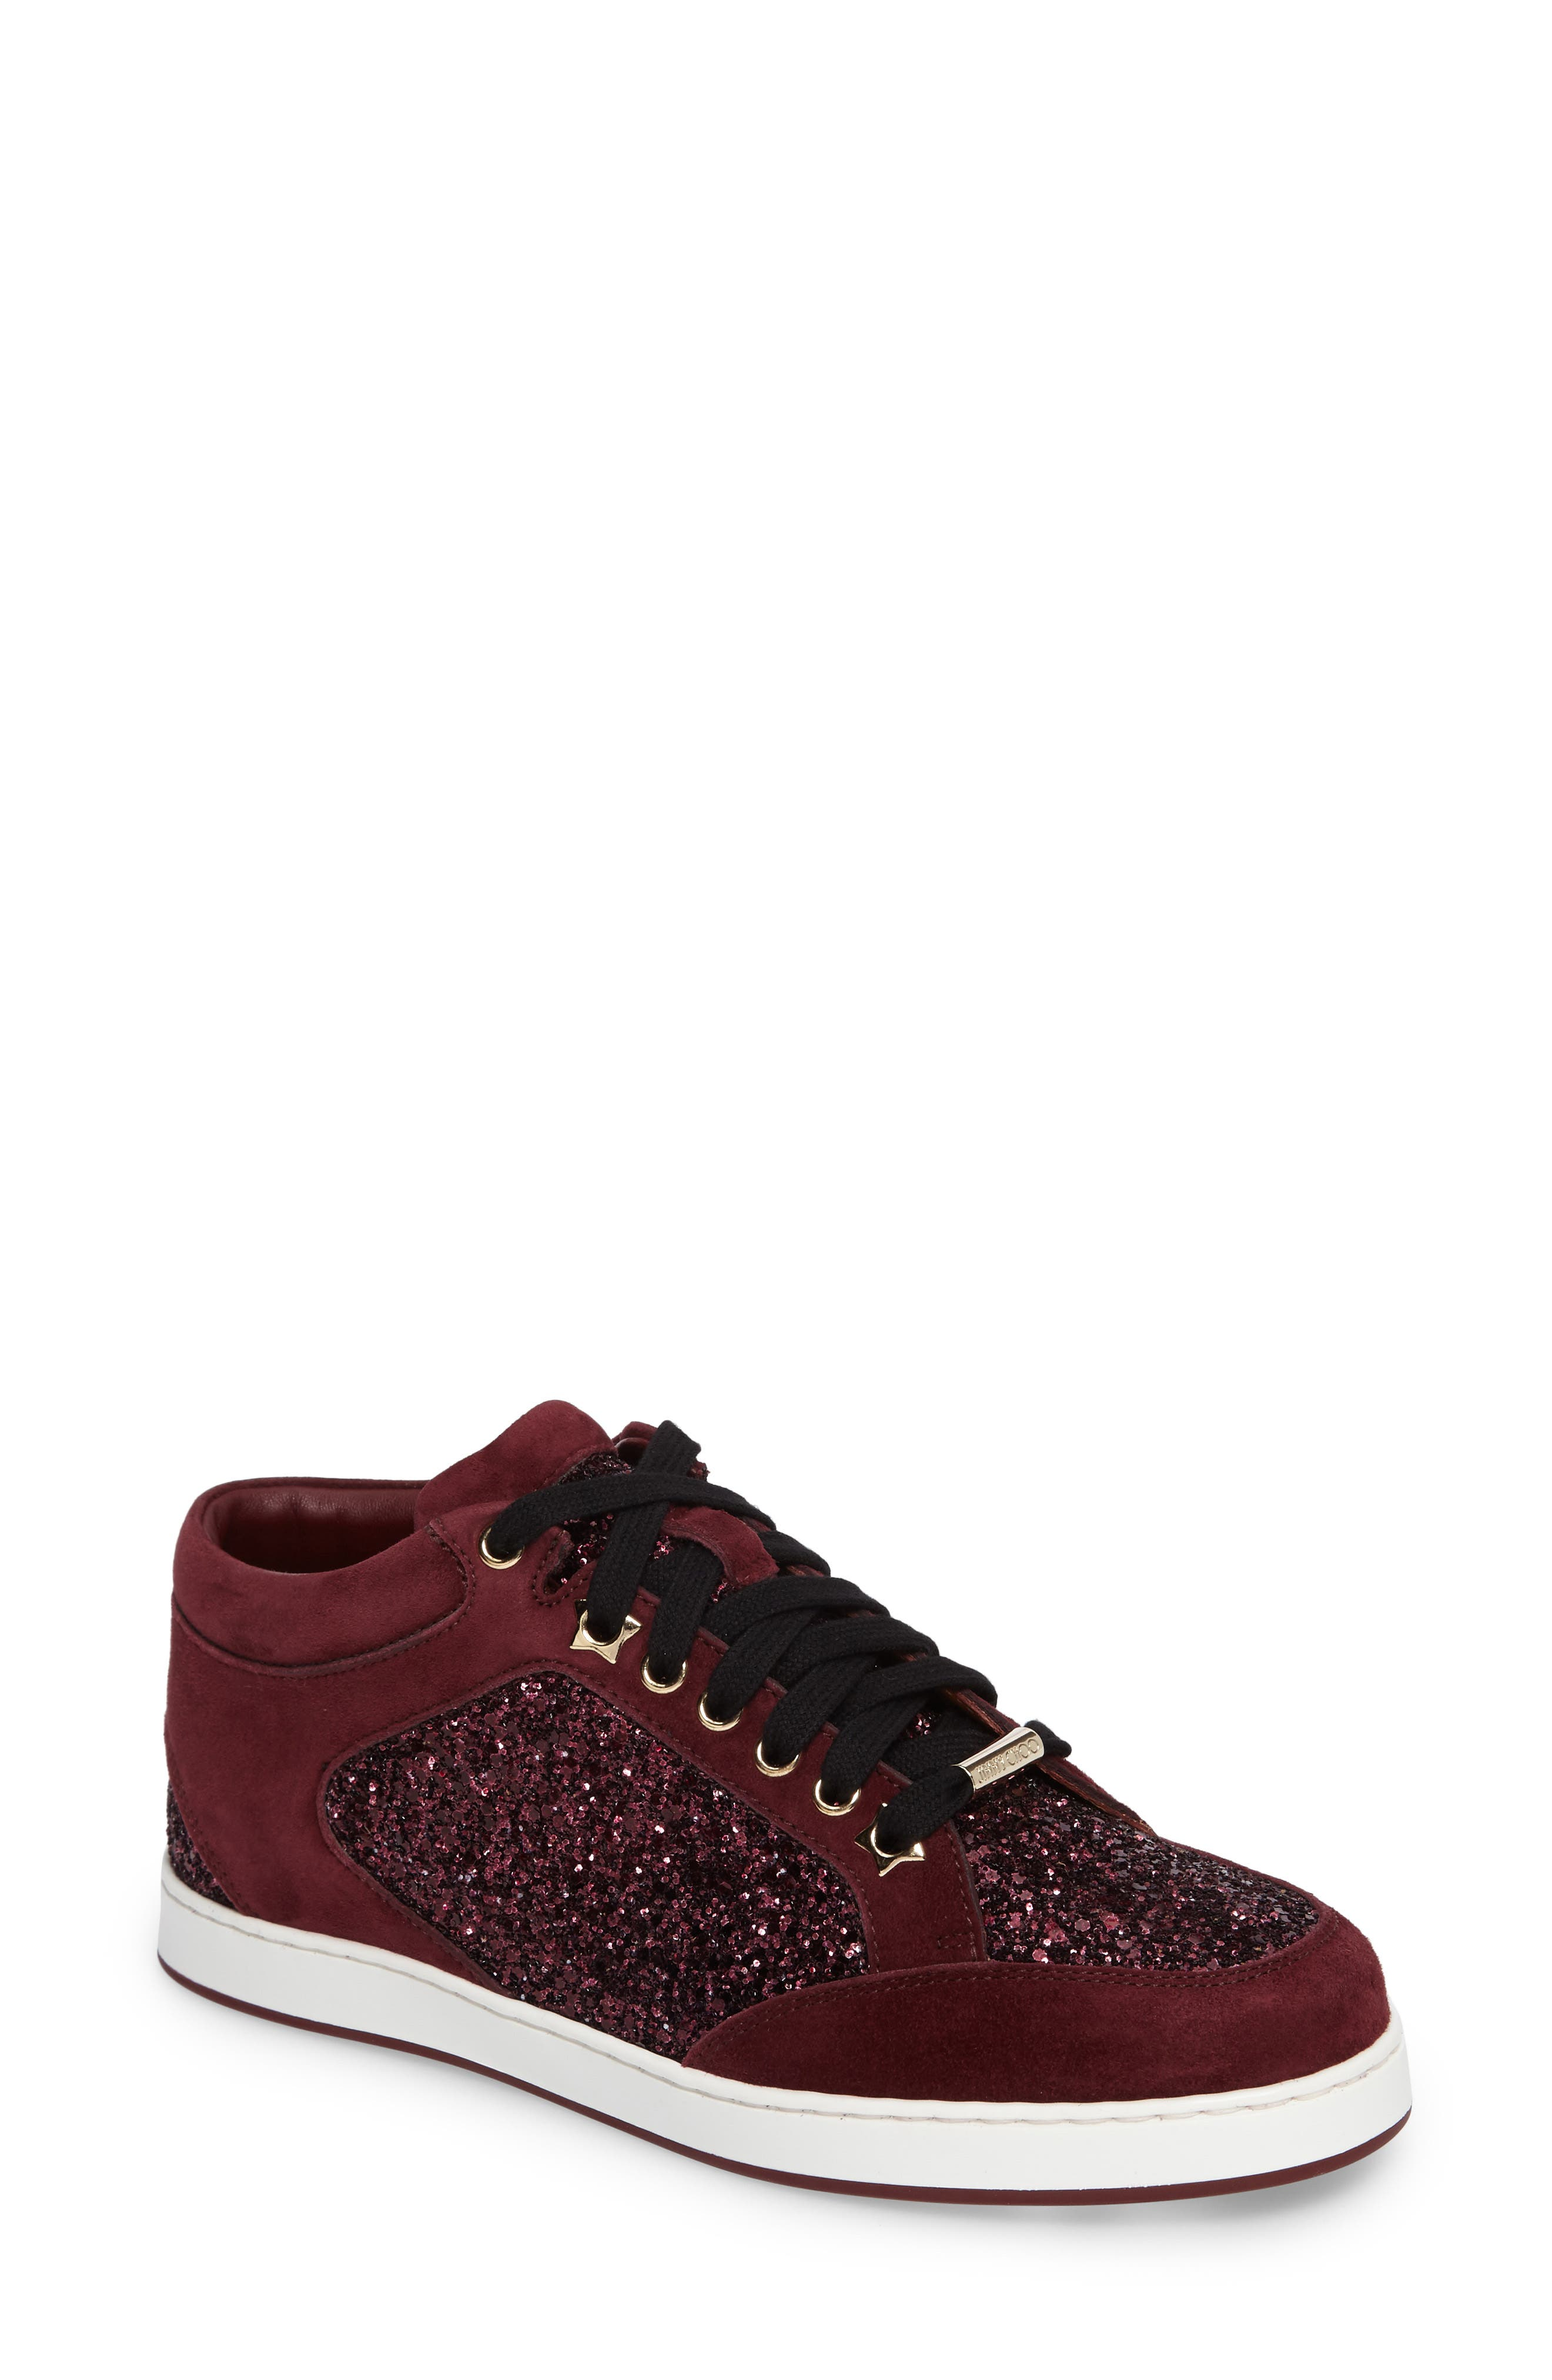 Main Image - Jimmy Choo Miami Low Top Sneaker (Women)